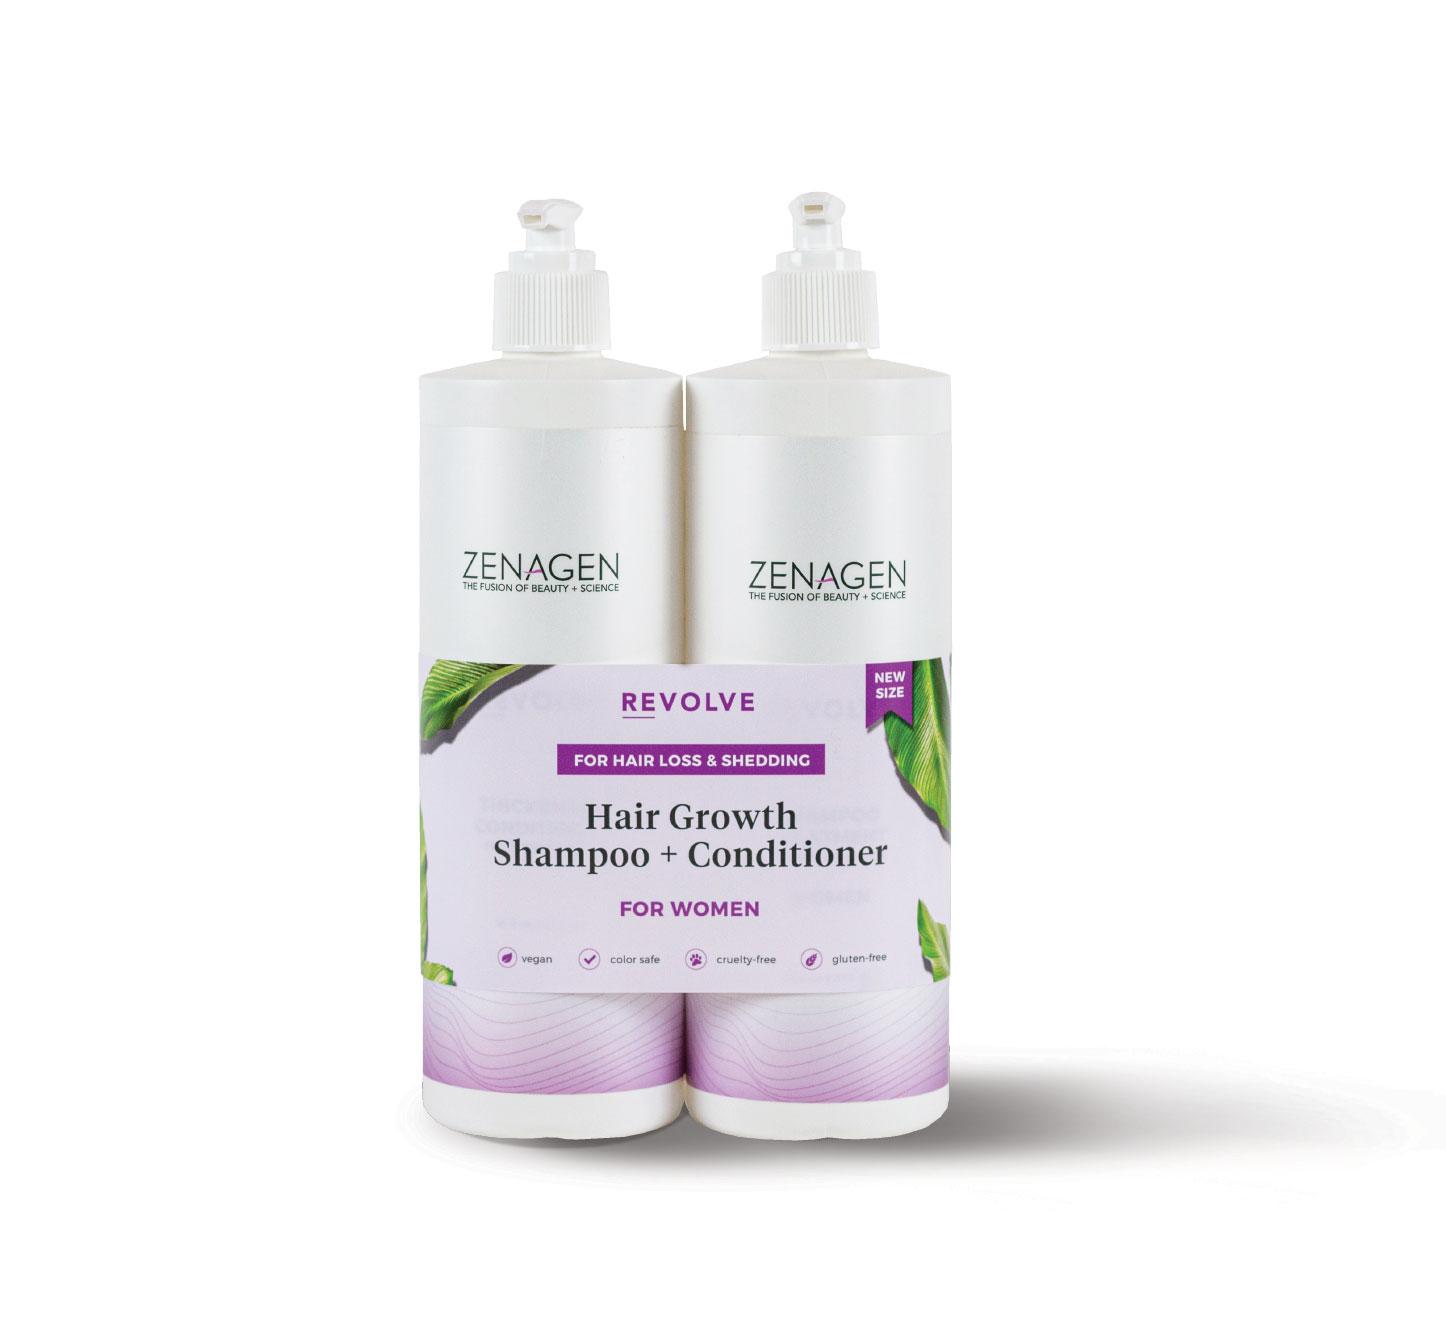 Revolve Treatment for Women Duo Zenagen